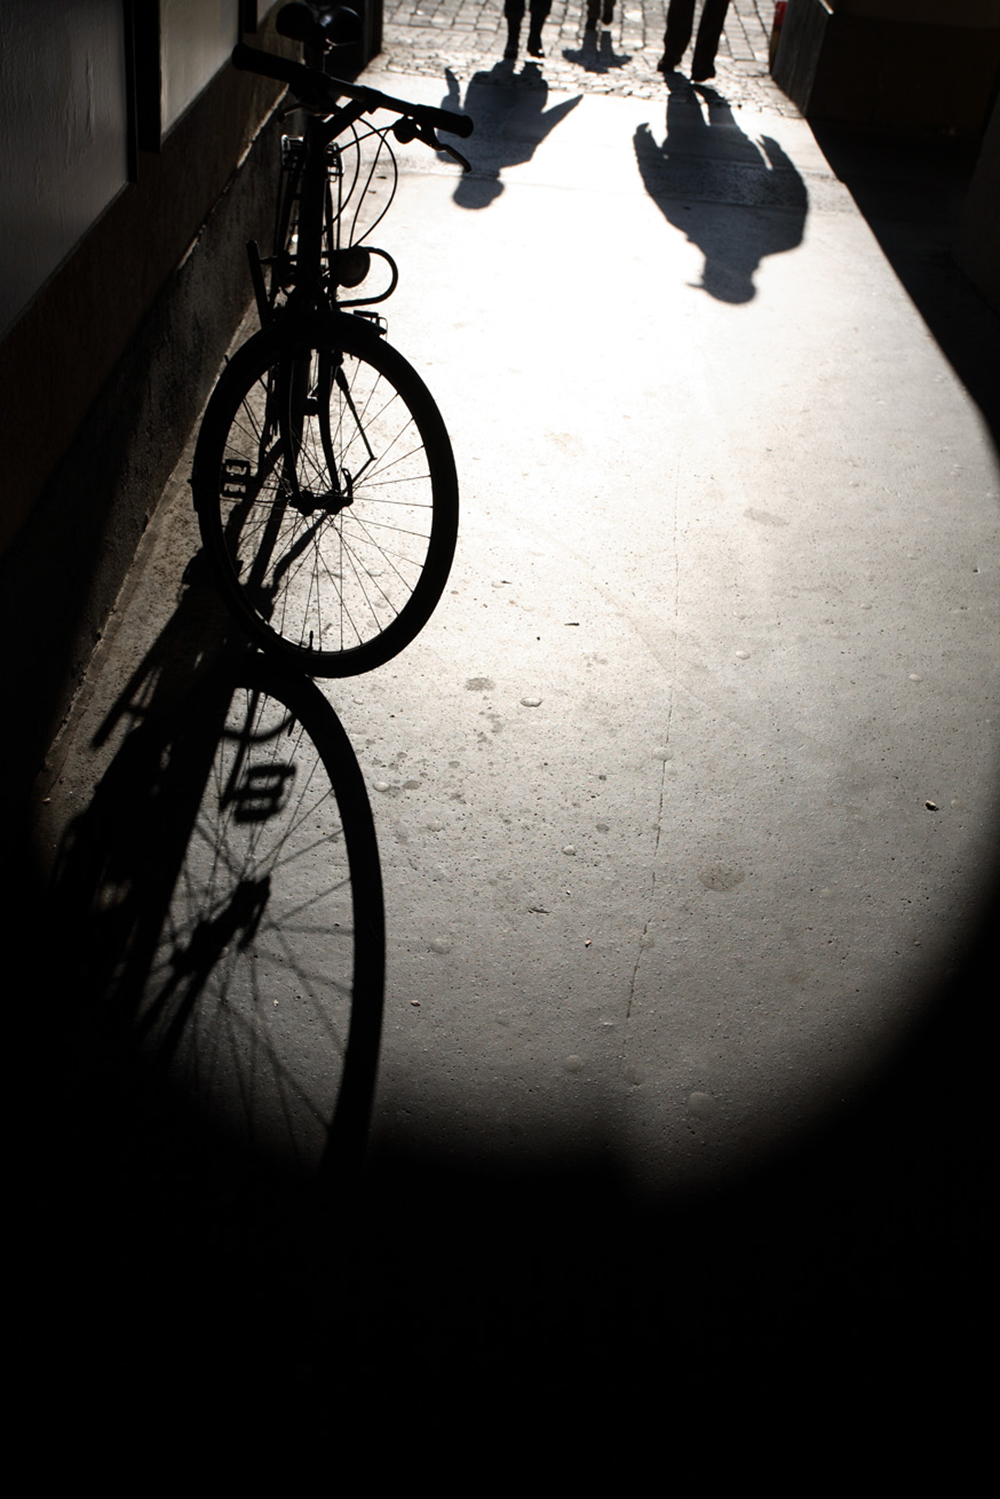 Trevor Skinner Schattenbild - Sóc Sant Feliu de Guíxols